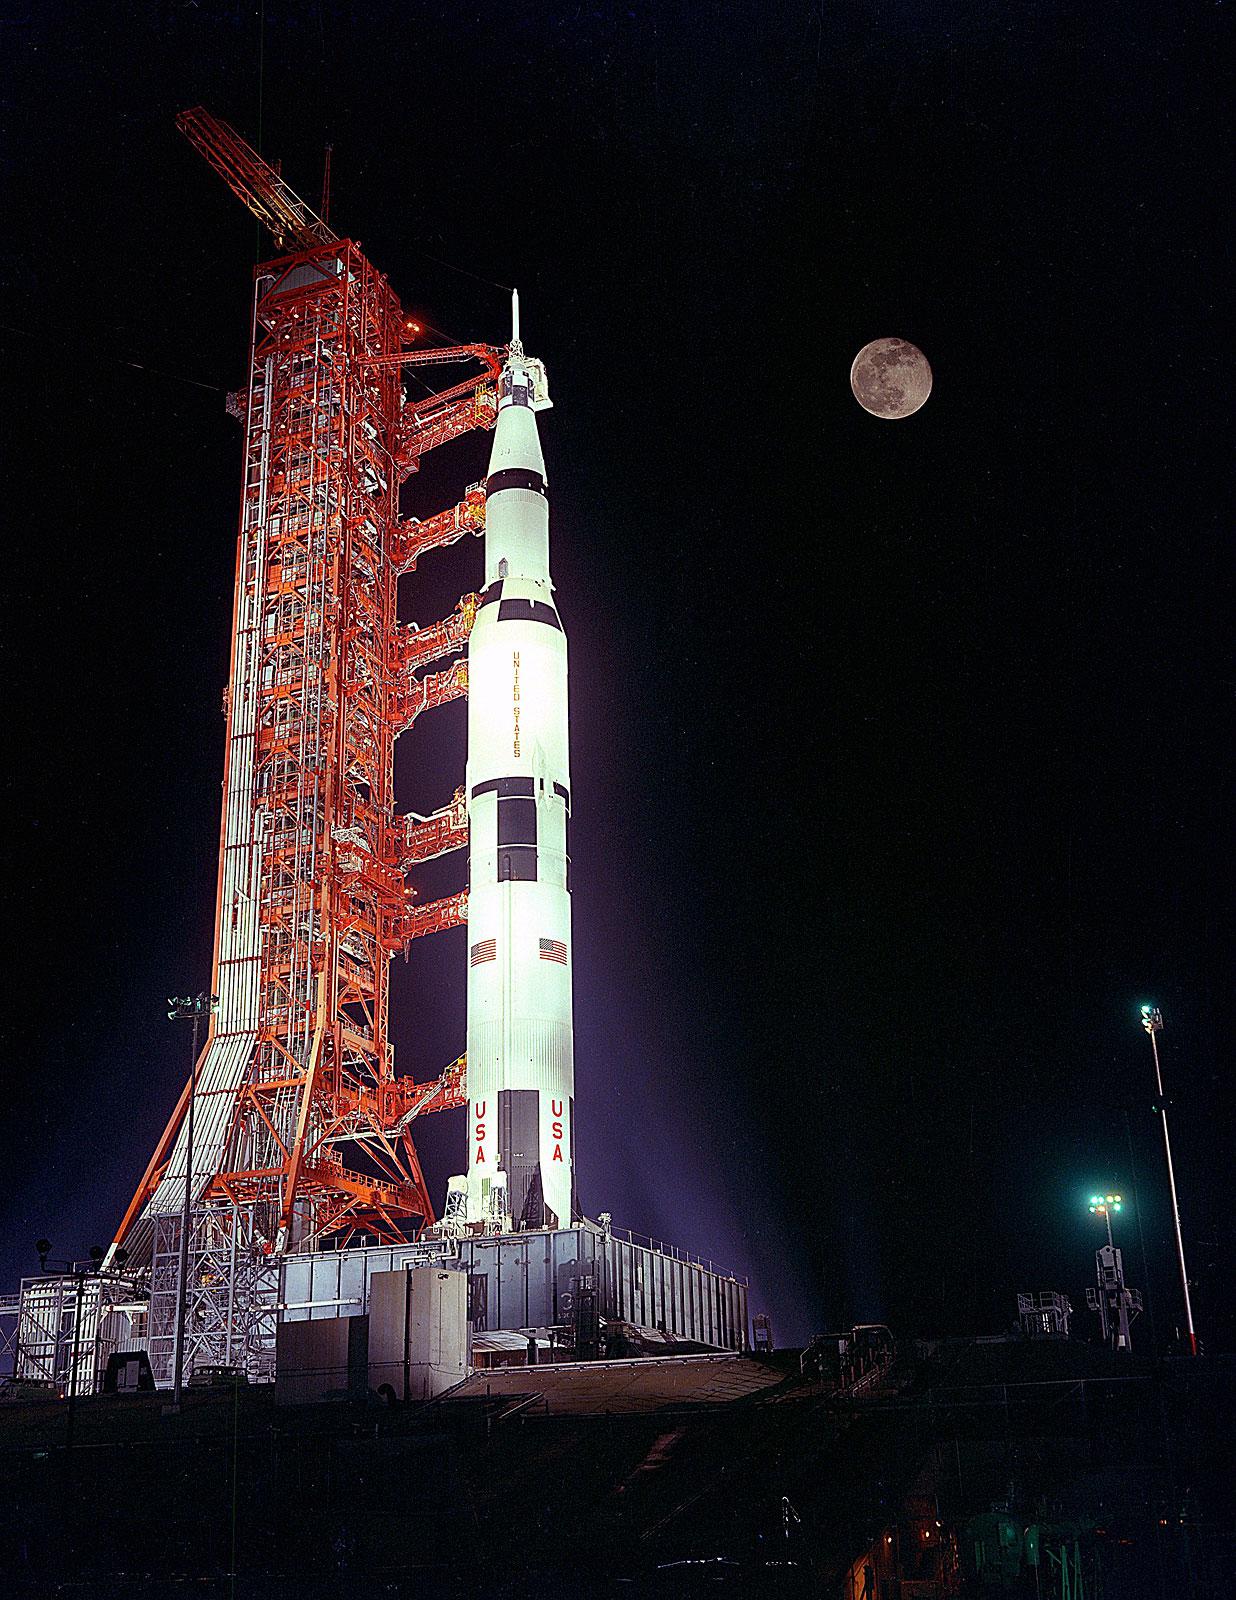 http://1.bp.blogspot.com/_04kZGR_ltmE/SsjyAUDFGKI/AAAAAAAAEwQ/EZFW29Z0OnA/s1600/Apollo-17.jpg